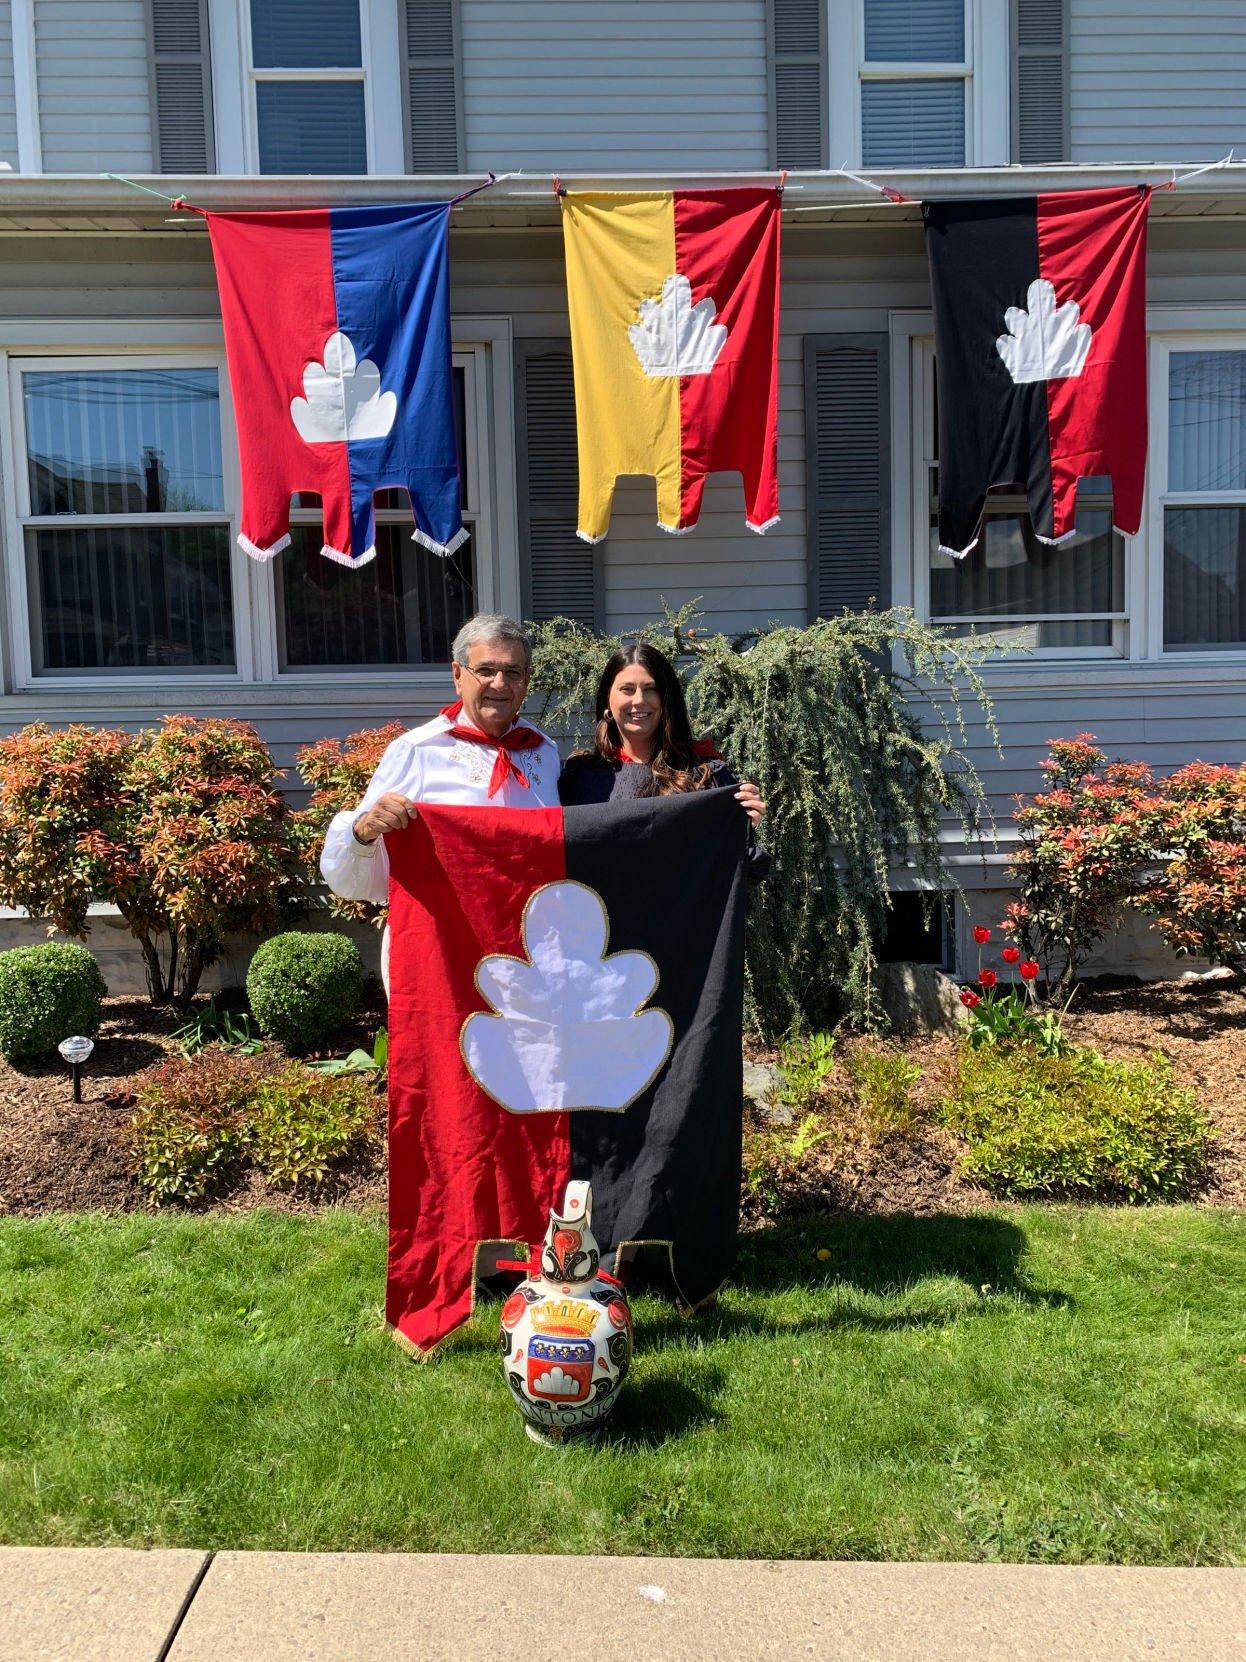 Albert Alunni of Jessup and Victoria Hanson of Dalton Hanson's St. Antonio flag from Gubbio, Italy.